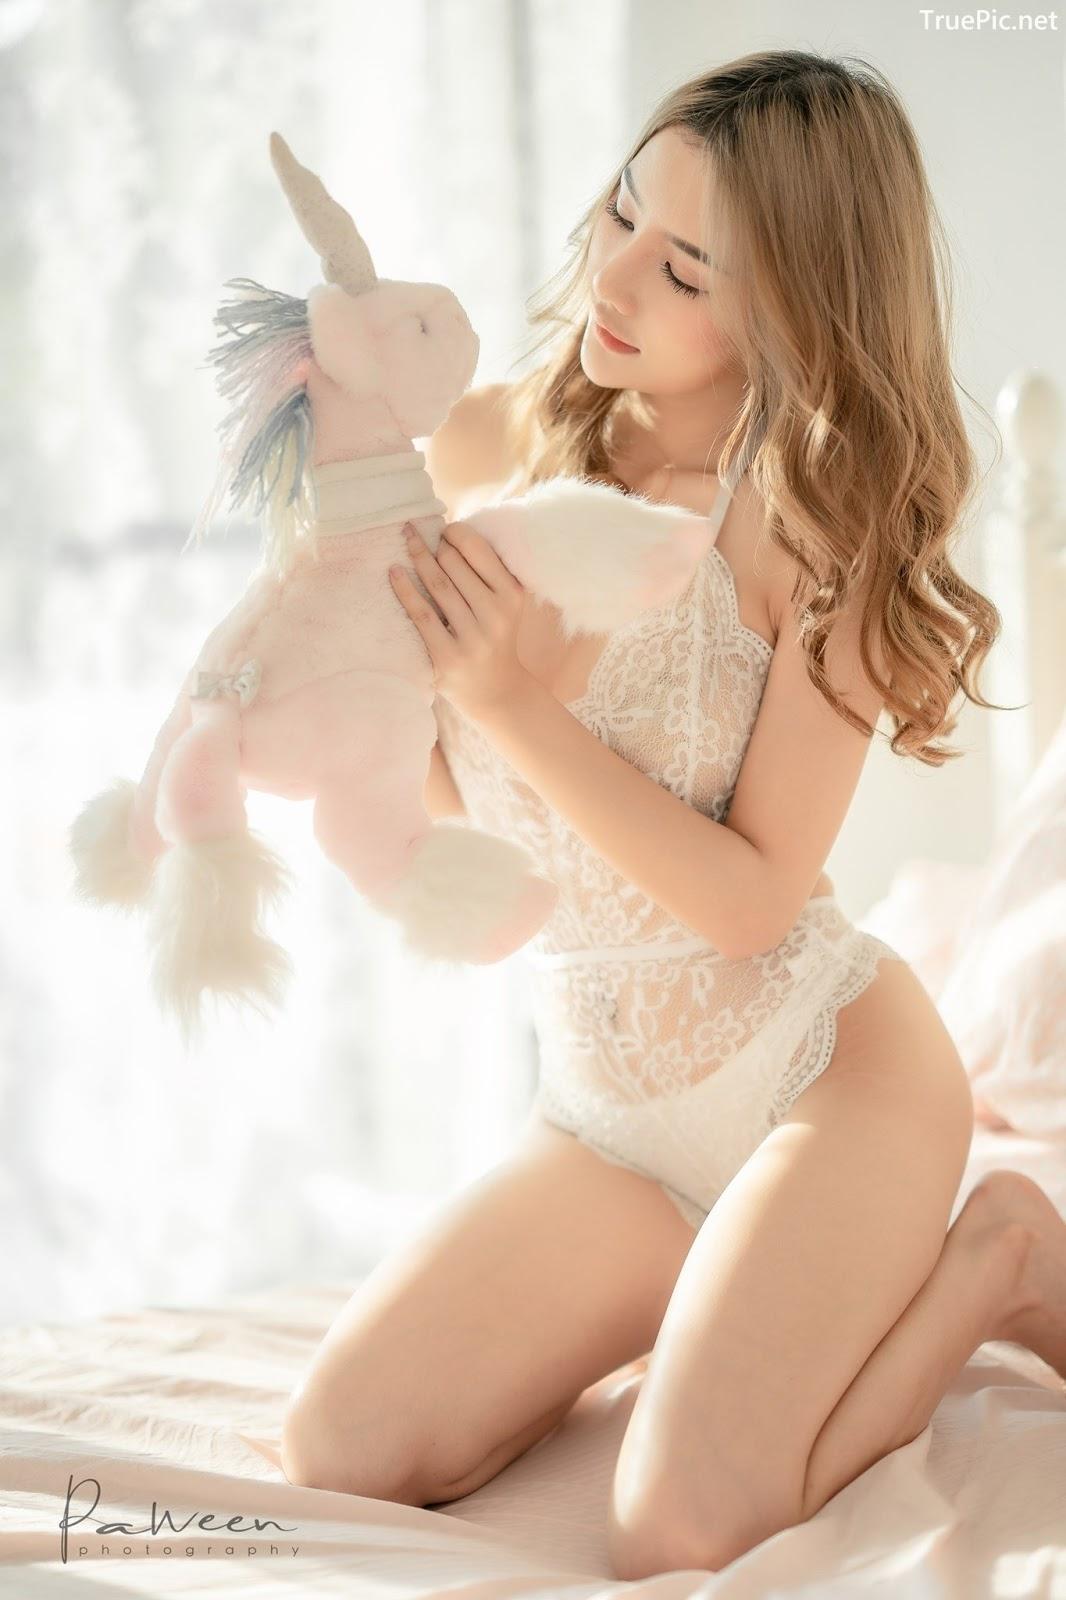 Image Thailand Model - Atittaya Chaiyasing - White Lace Lingerie - TruePic.net - Picture-15